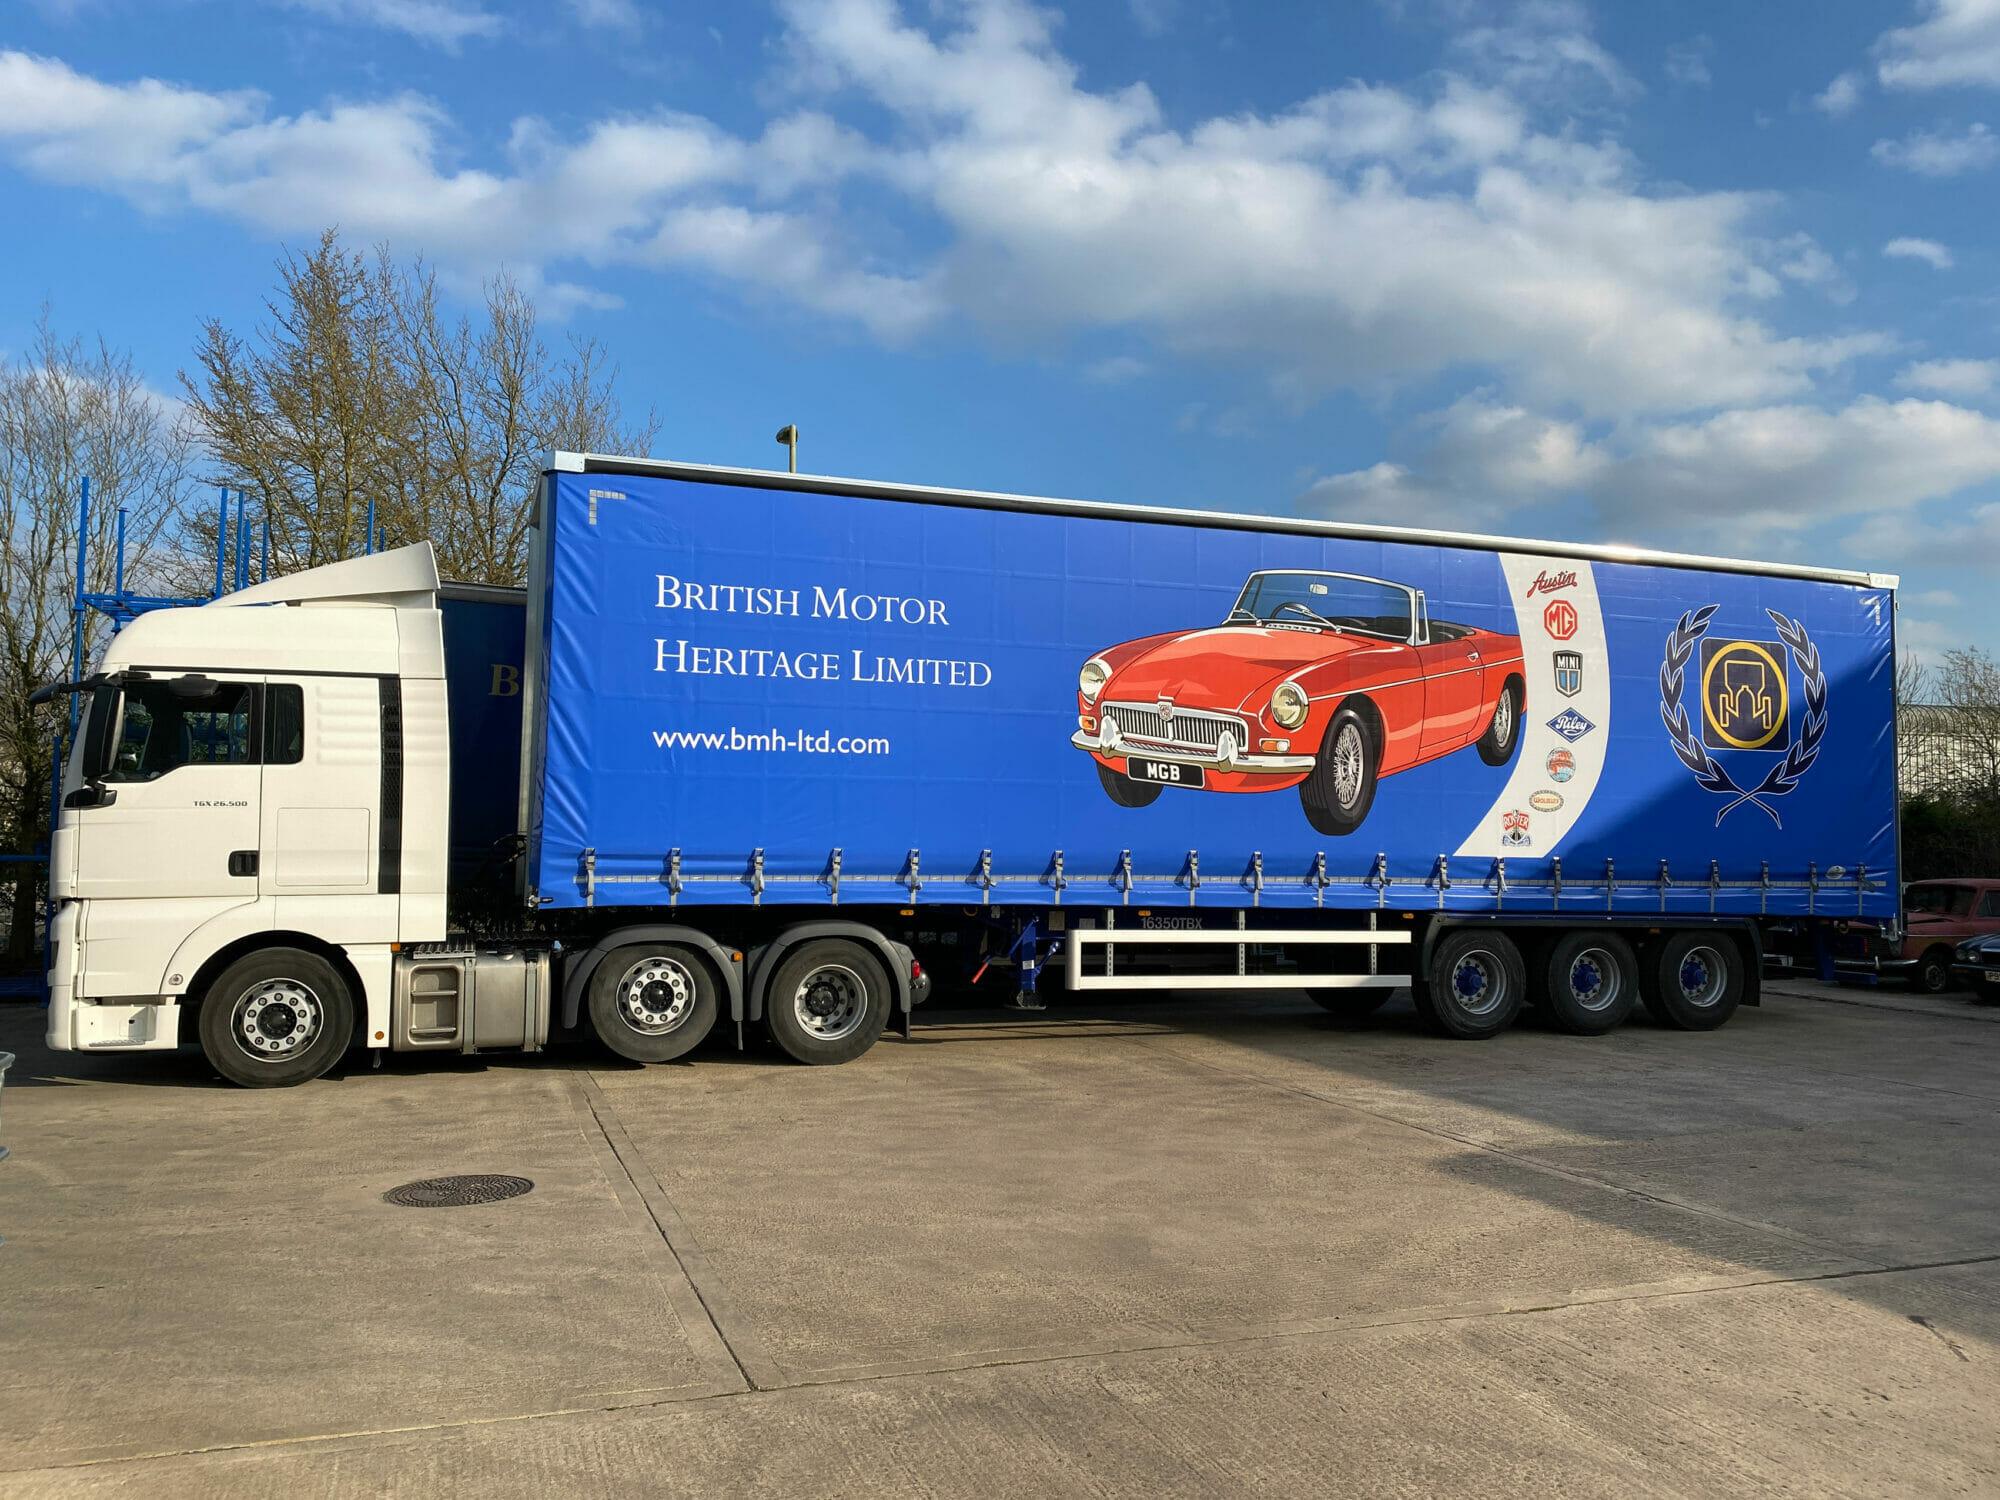 British Motor Heritage truck